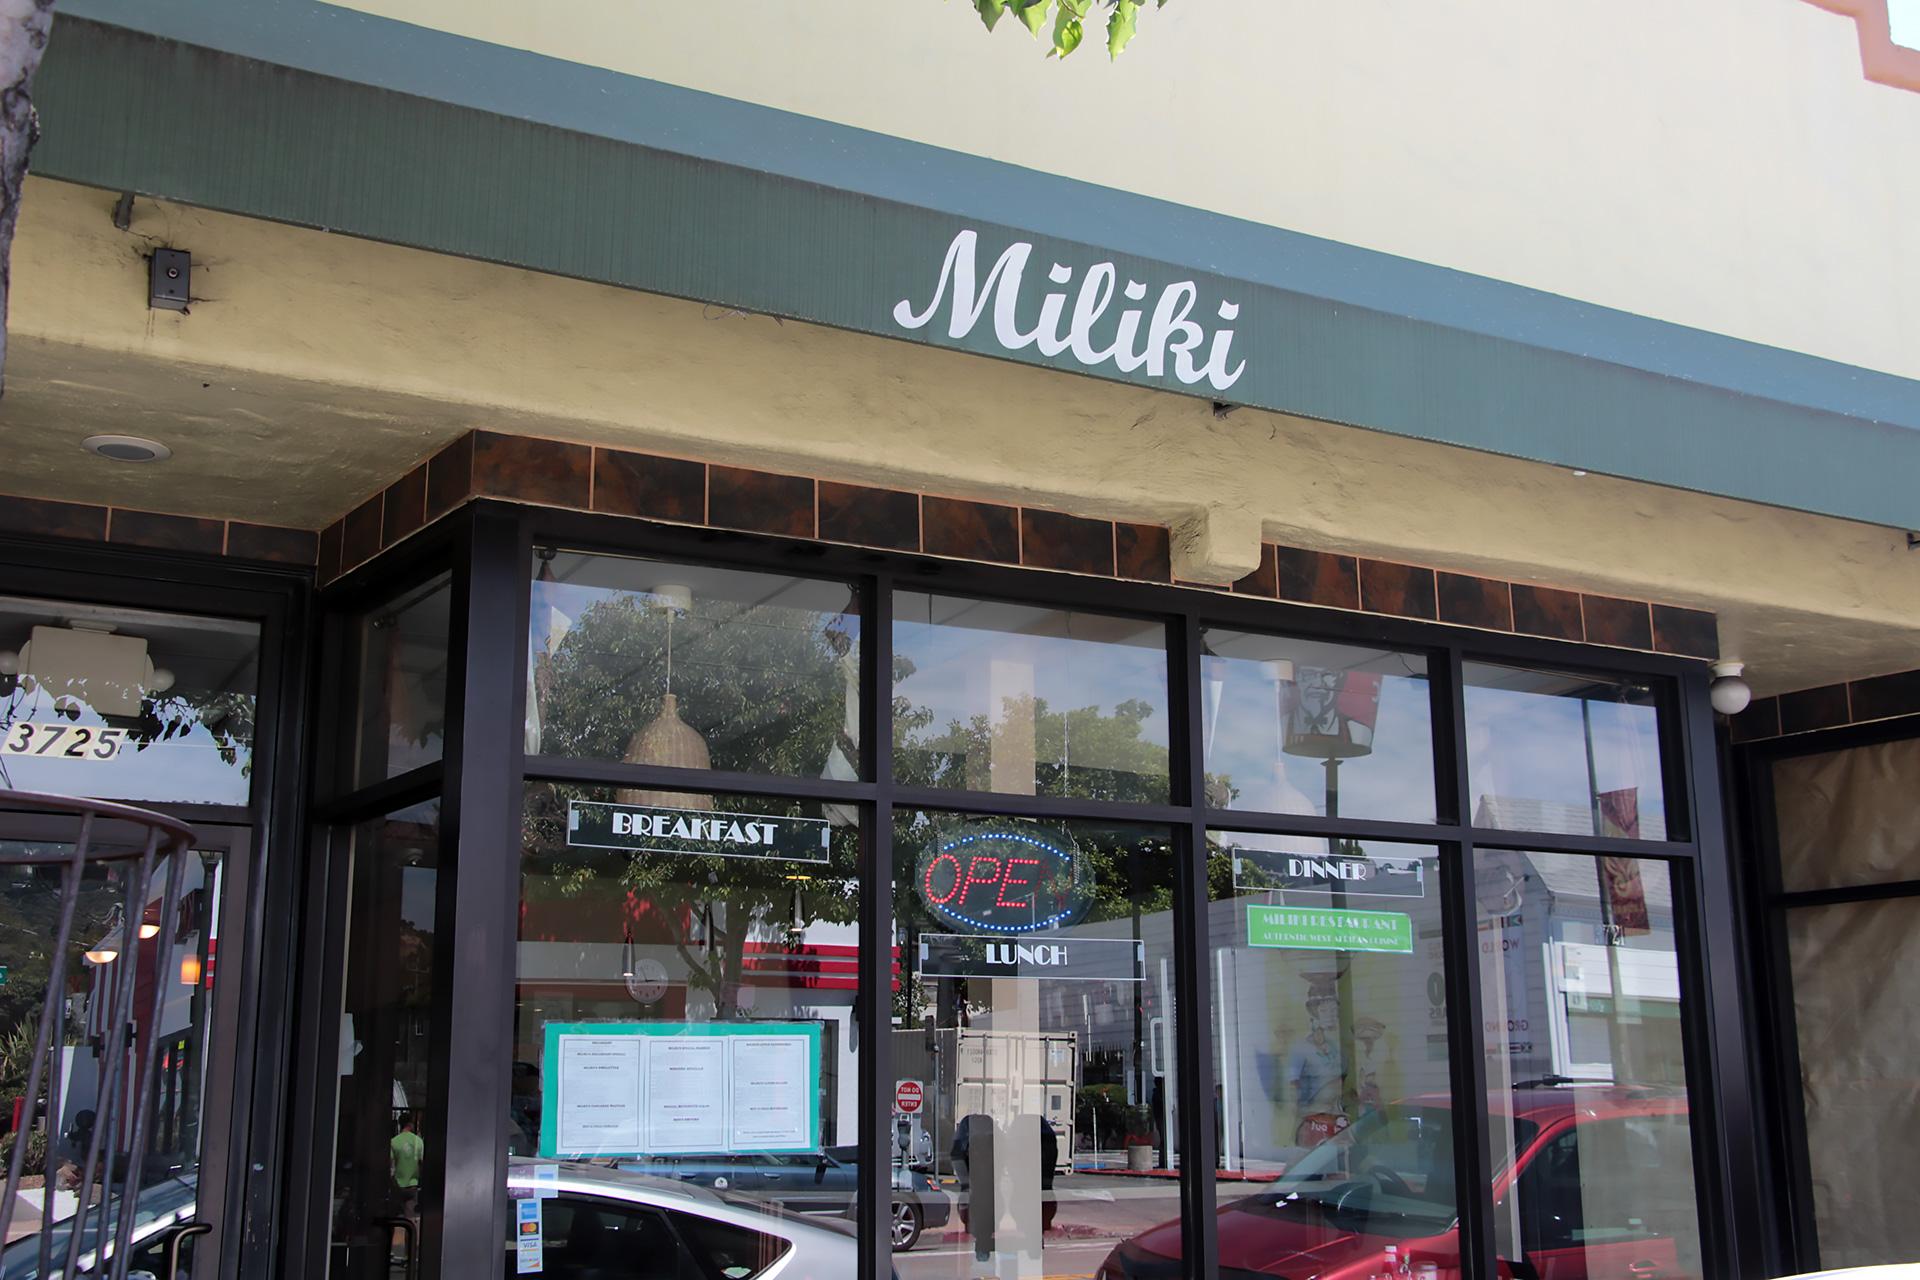 Miliki exterior on MacArthur Ave. in Oakland's Laurel district.